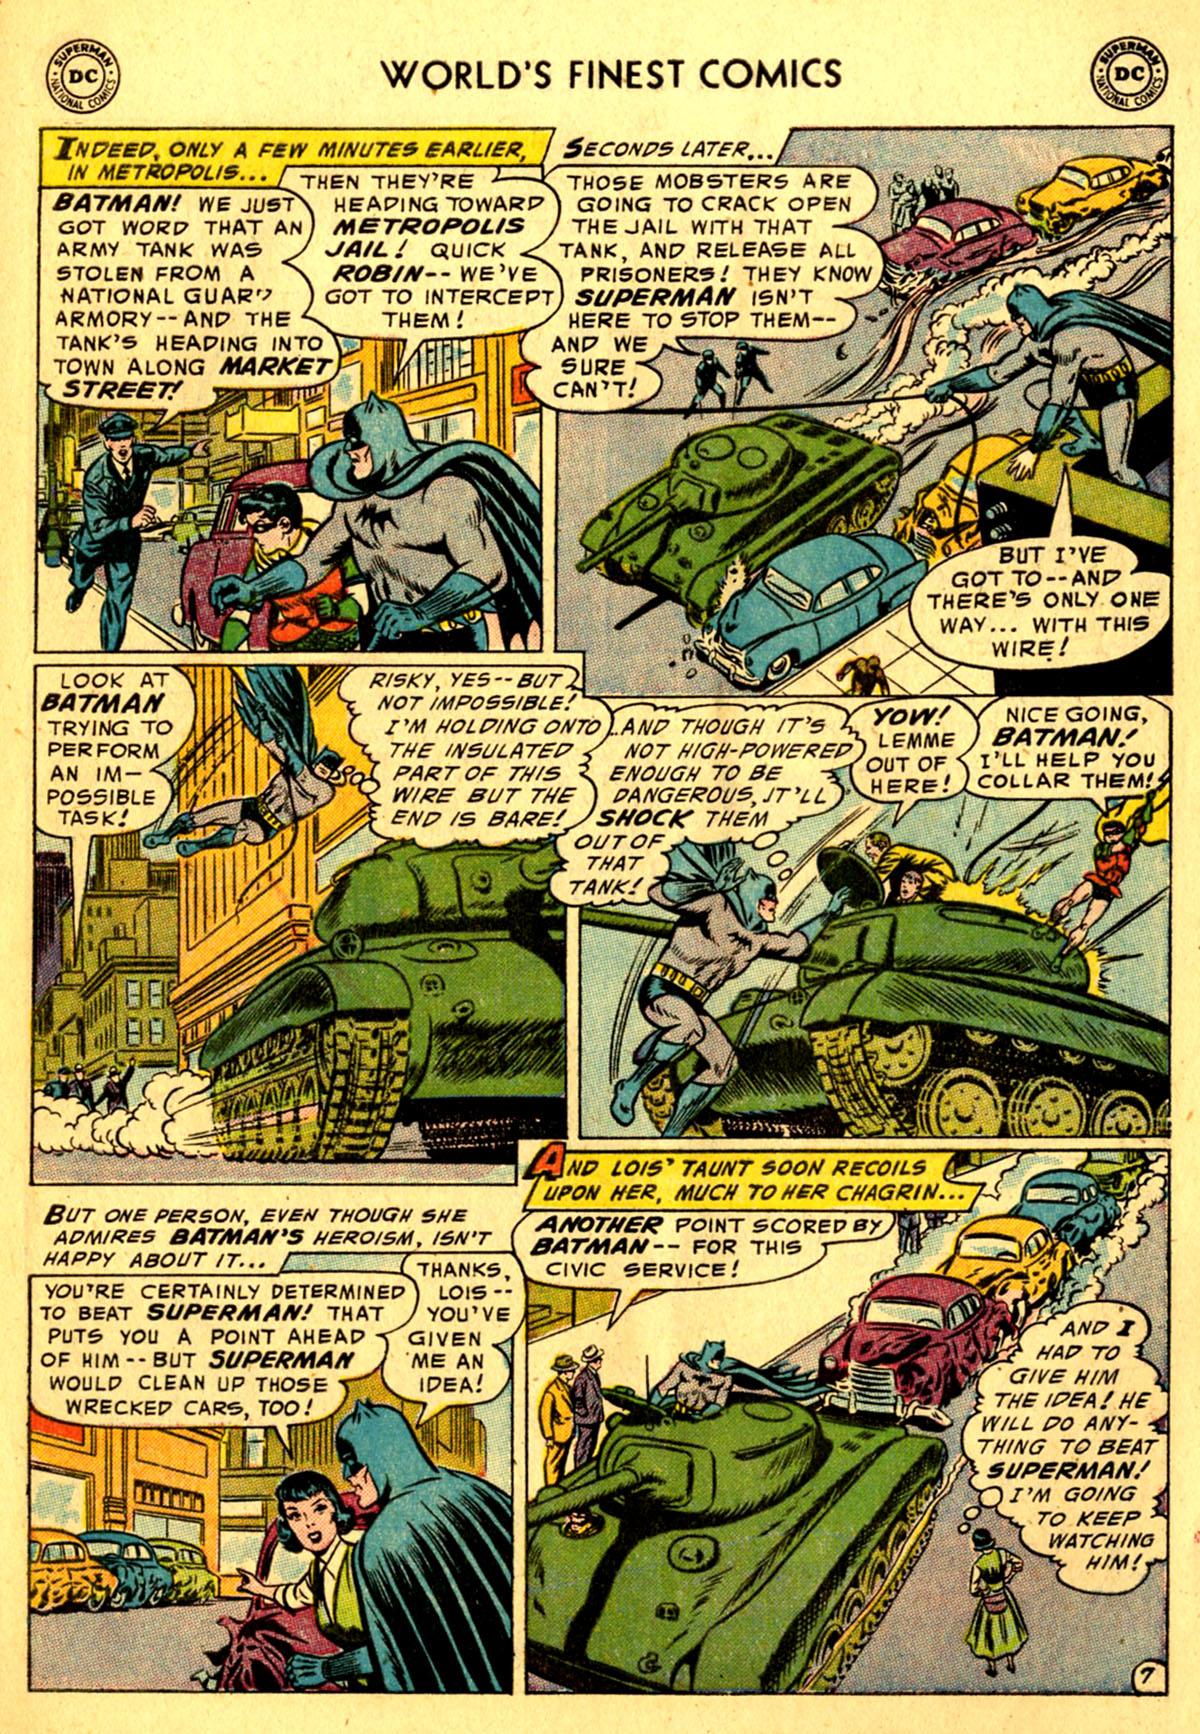 Read online World's Finest Comics comic -  Issue #76 - 9